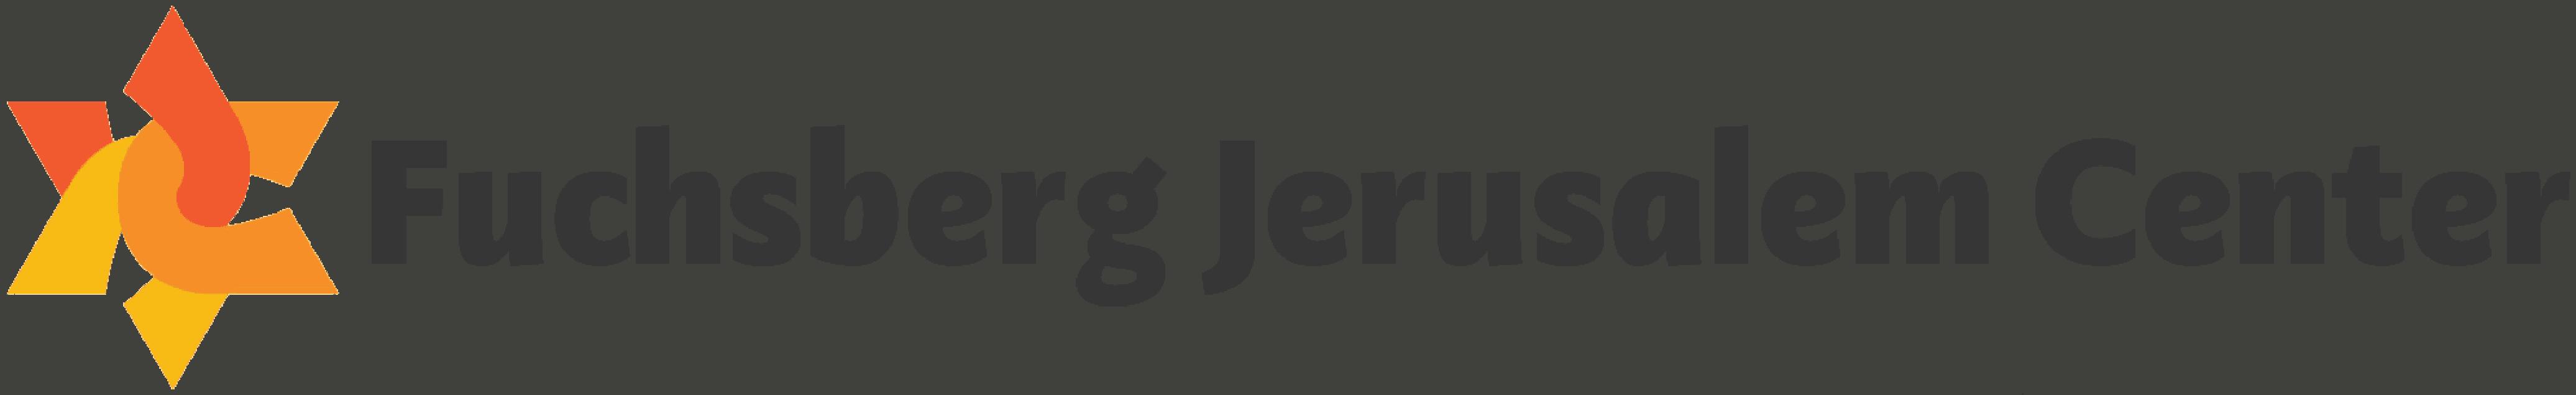 fuchsberg logo - contact us on israel@uscj.org